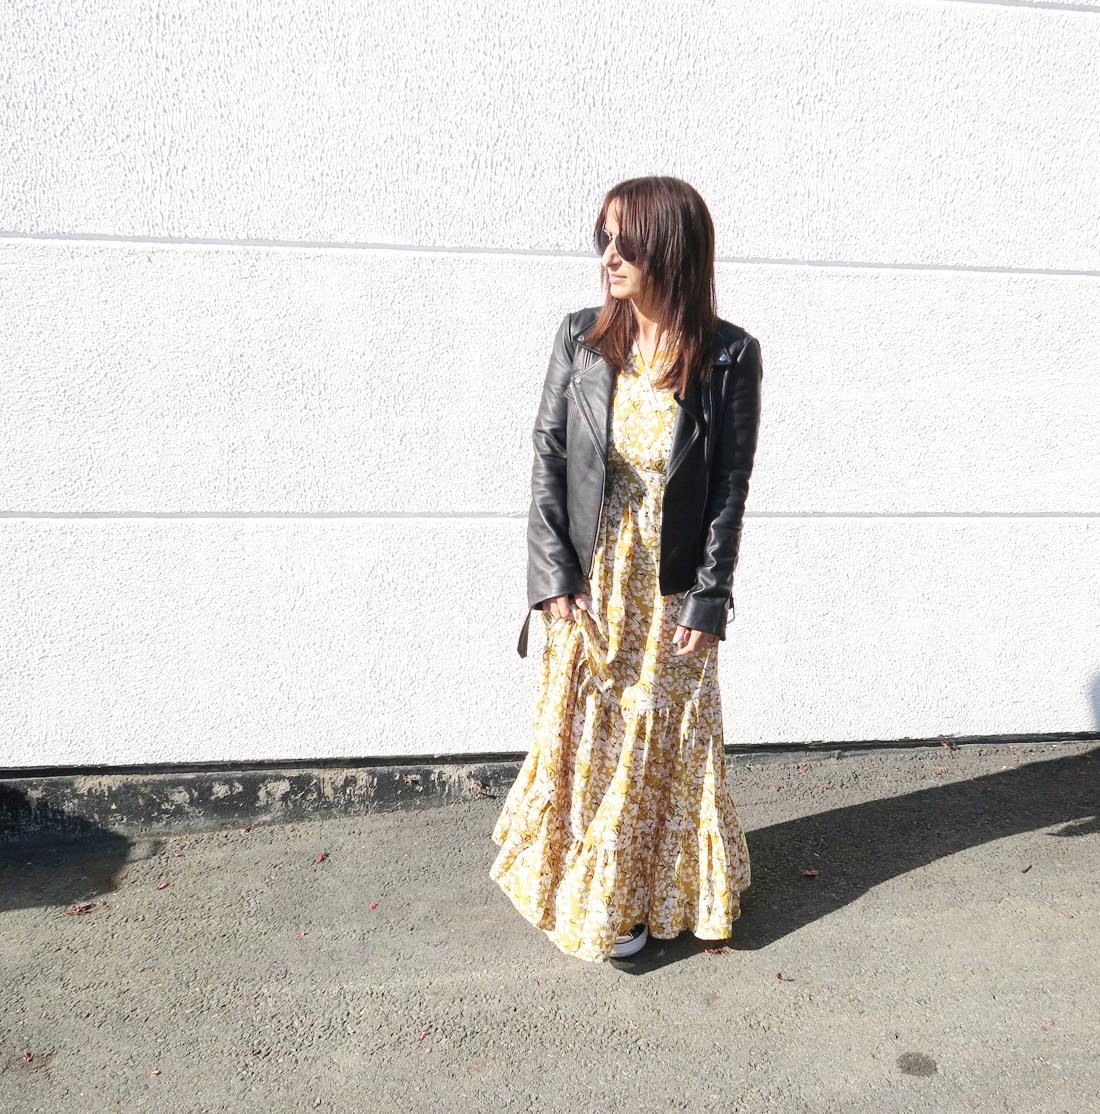 dressfo-kleid-modeblogger-fashionblogger-blogger-style-fashion-modesalat-streetstyle-10